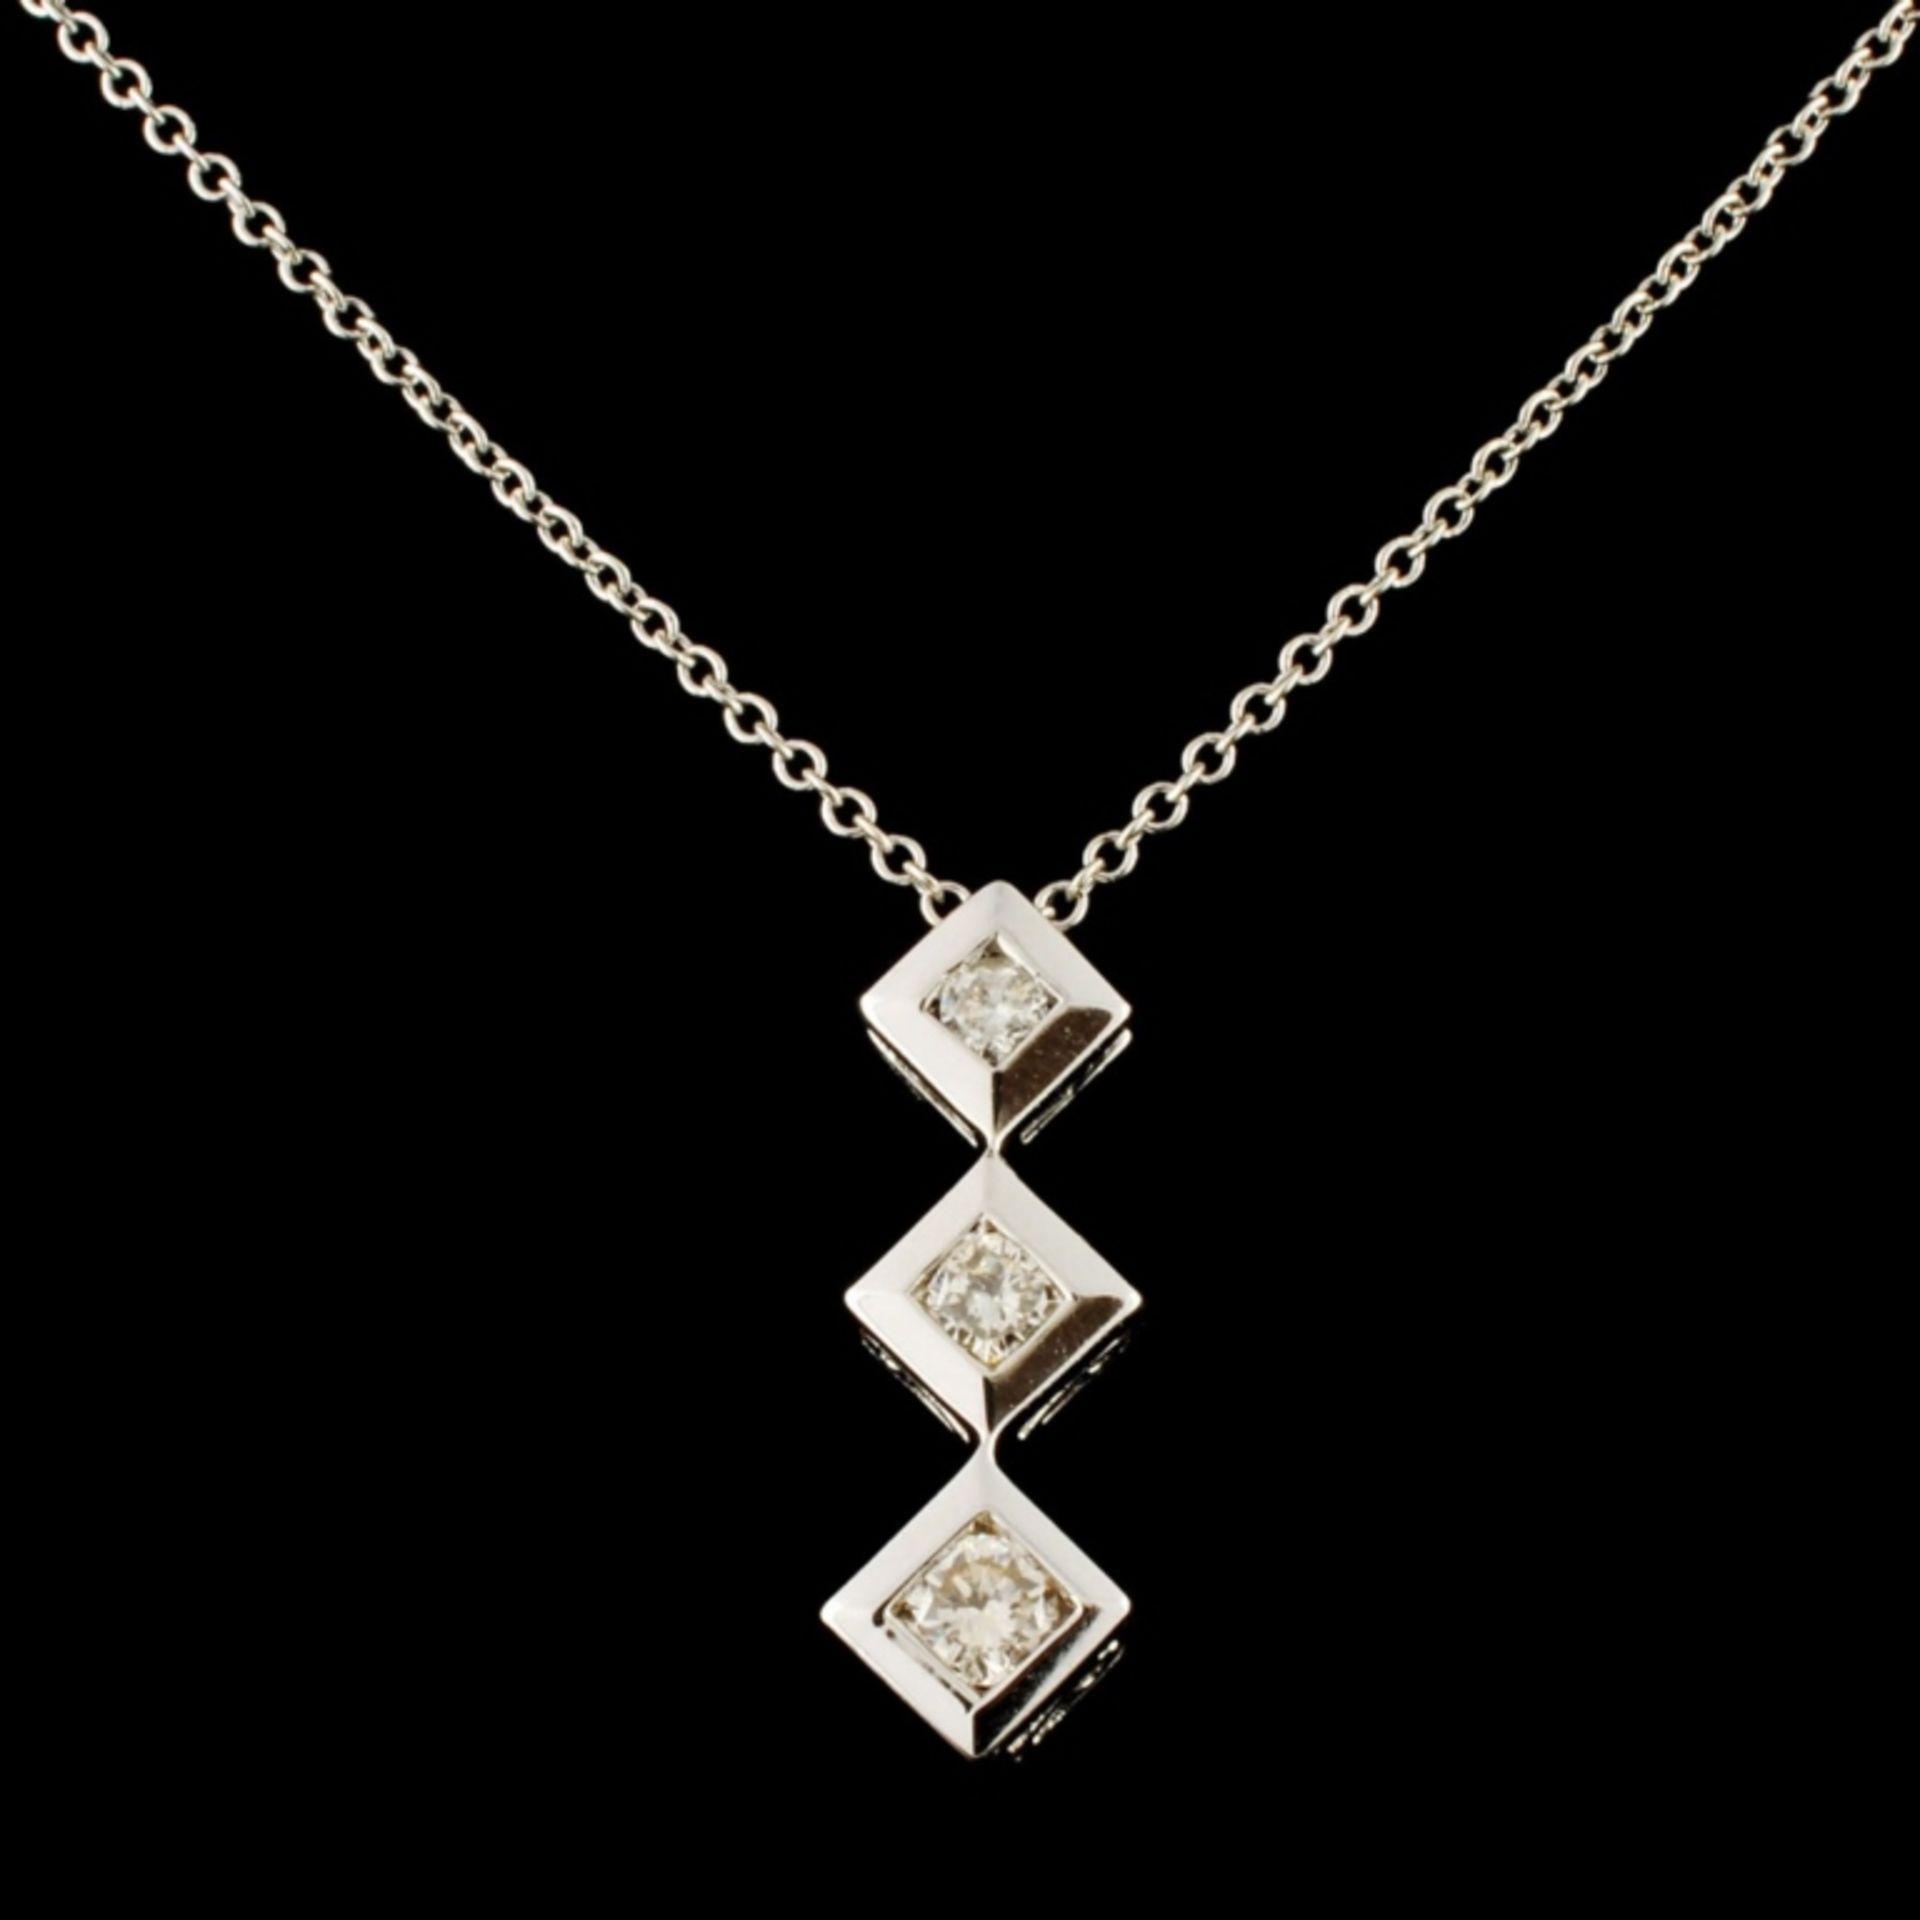 14K Gold 0.25ctw Diamond Pendant - Image 2 of 4